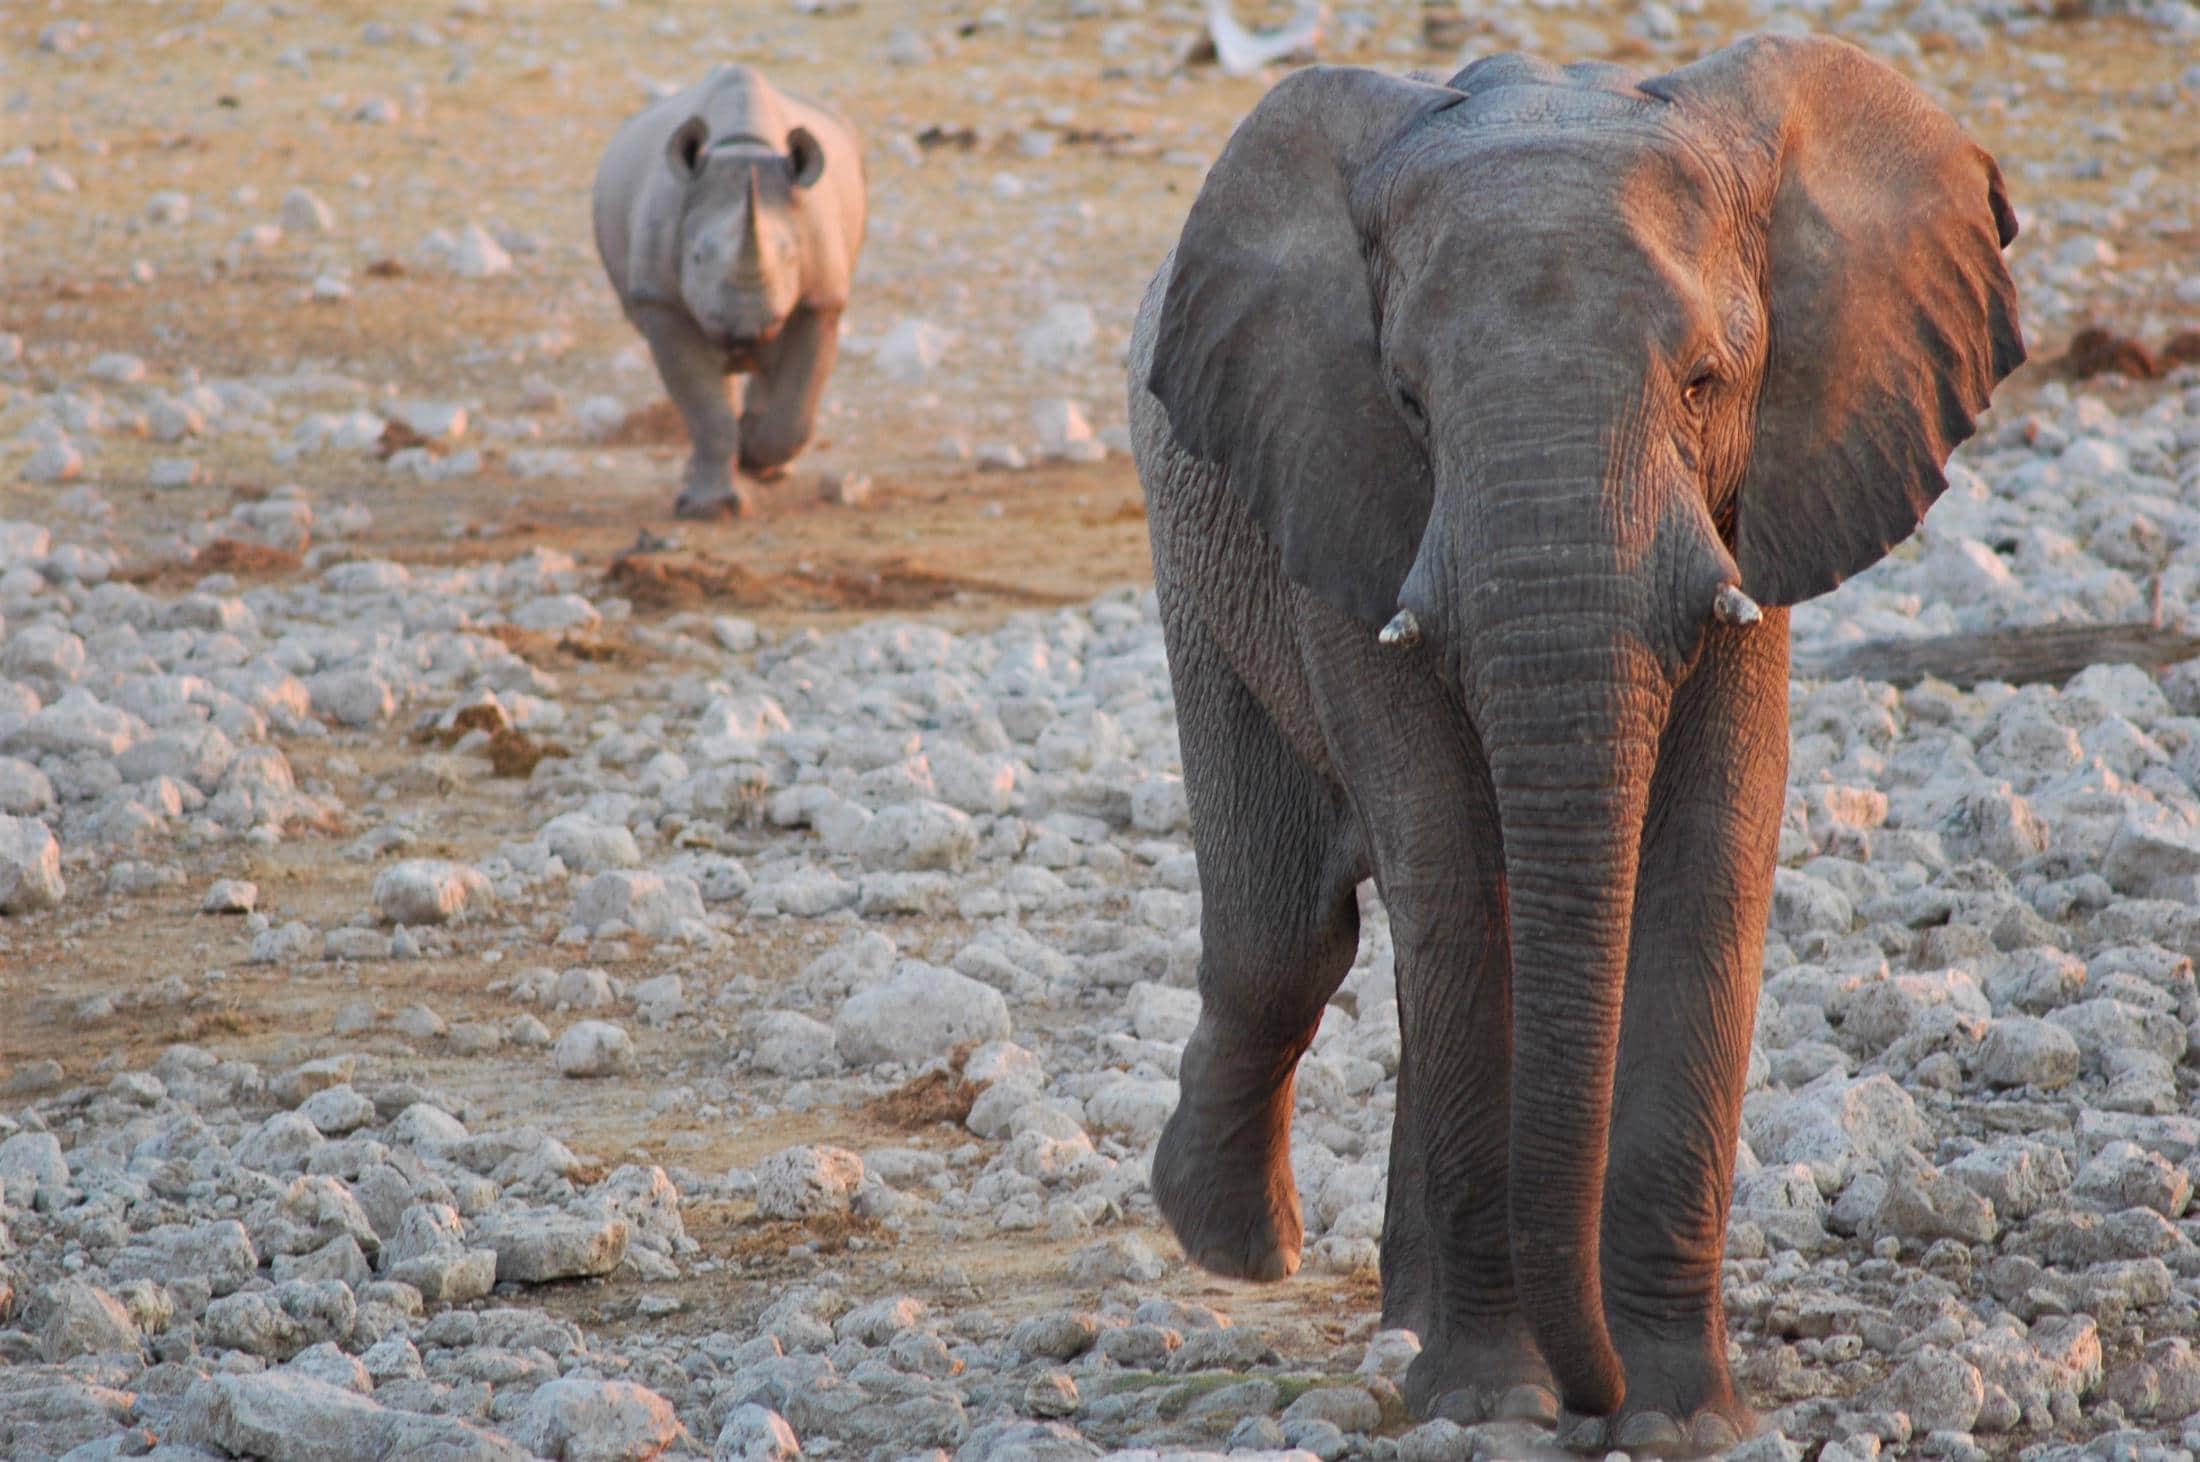 Rondreizen Zuid-Afrika, Namibië en Botswana - Zwarte neushoorn volgt olifant in Etosha National Park